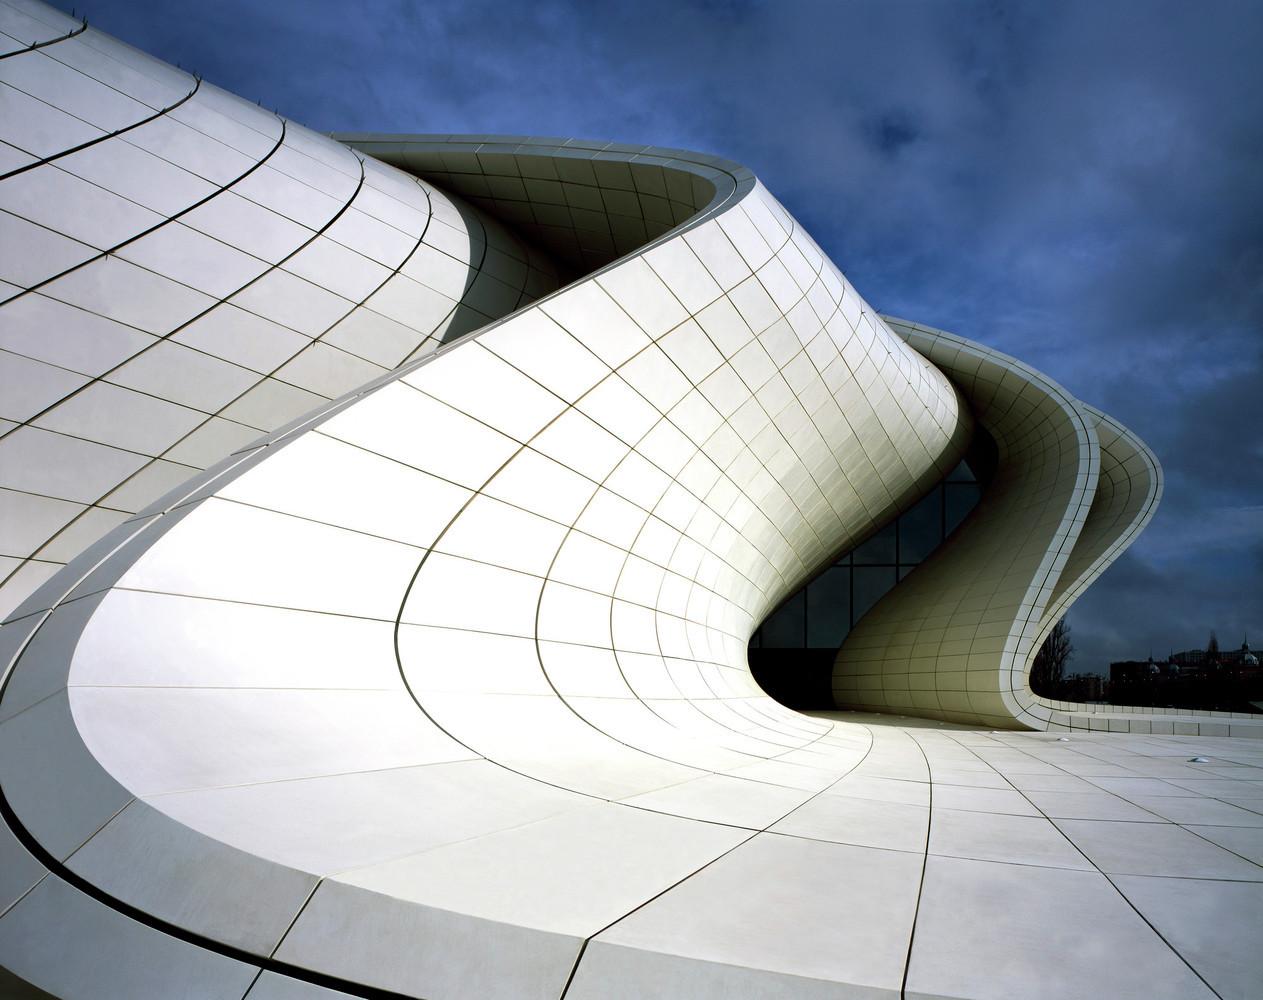 архитектура из фибробетона